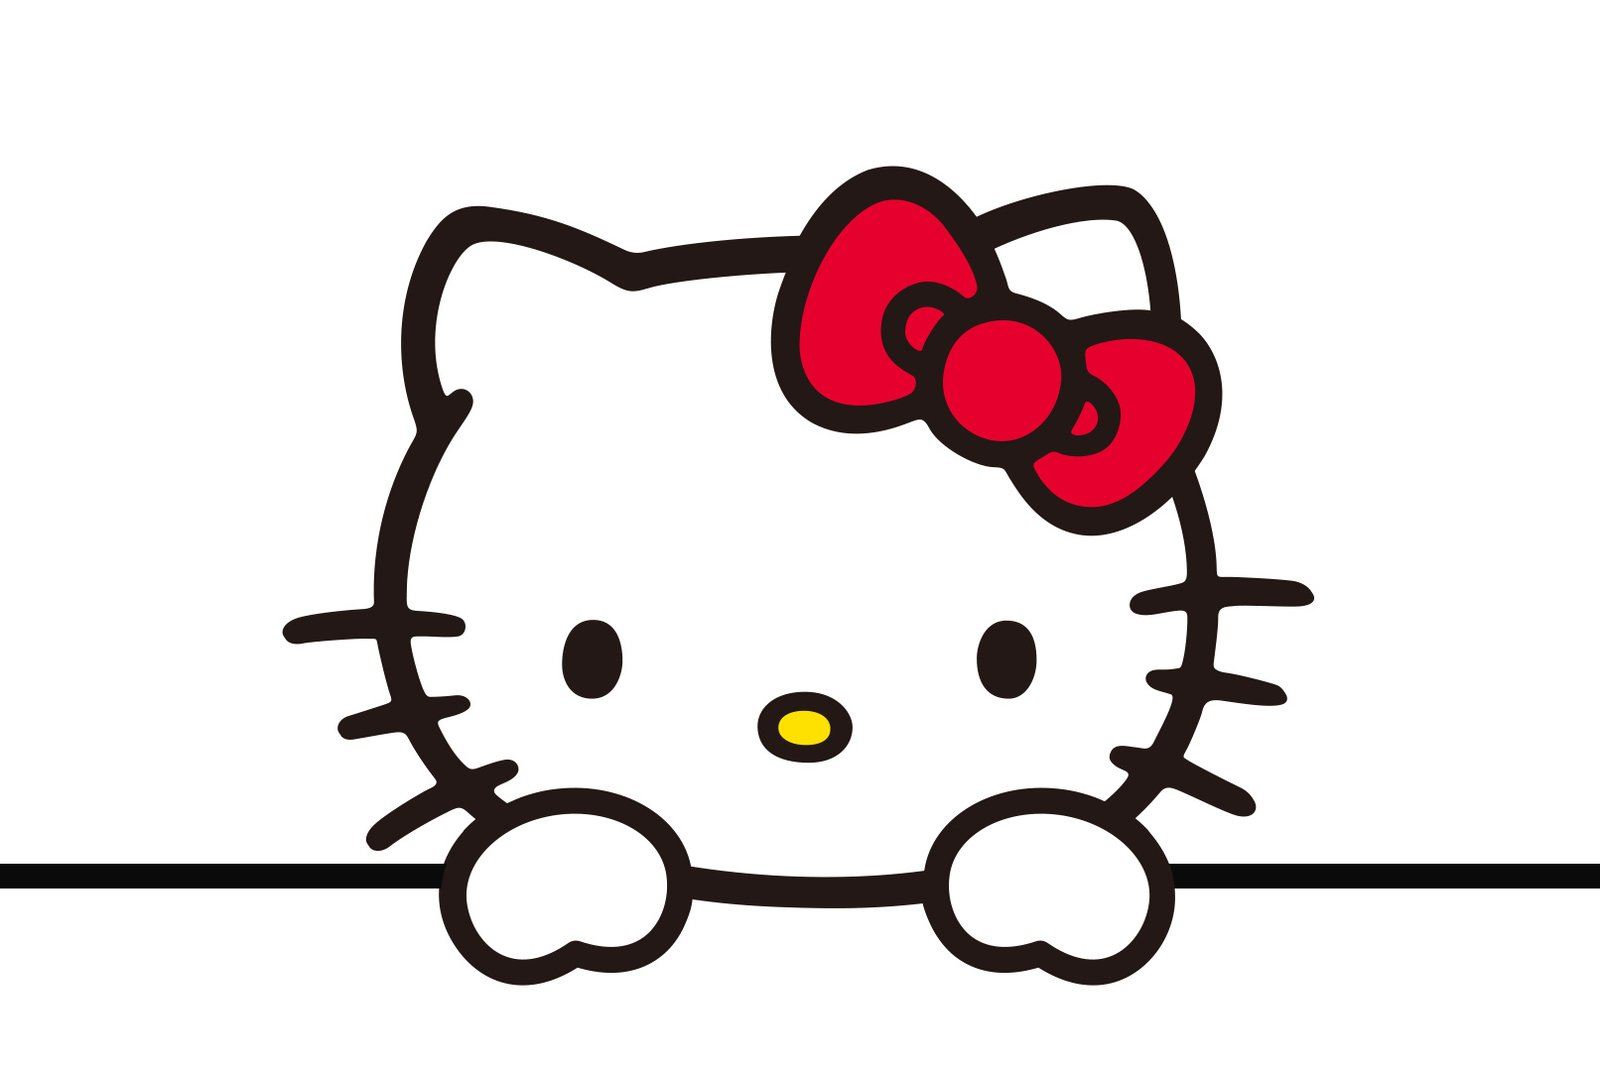 f21faae37 Hello Kitty Heads to Hollywood with New Movie! | Tokyo Otaku Mode News